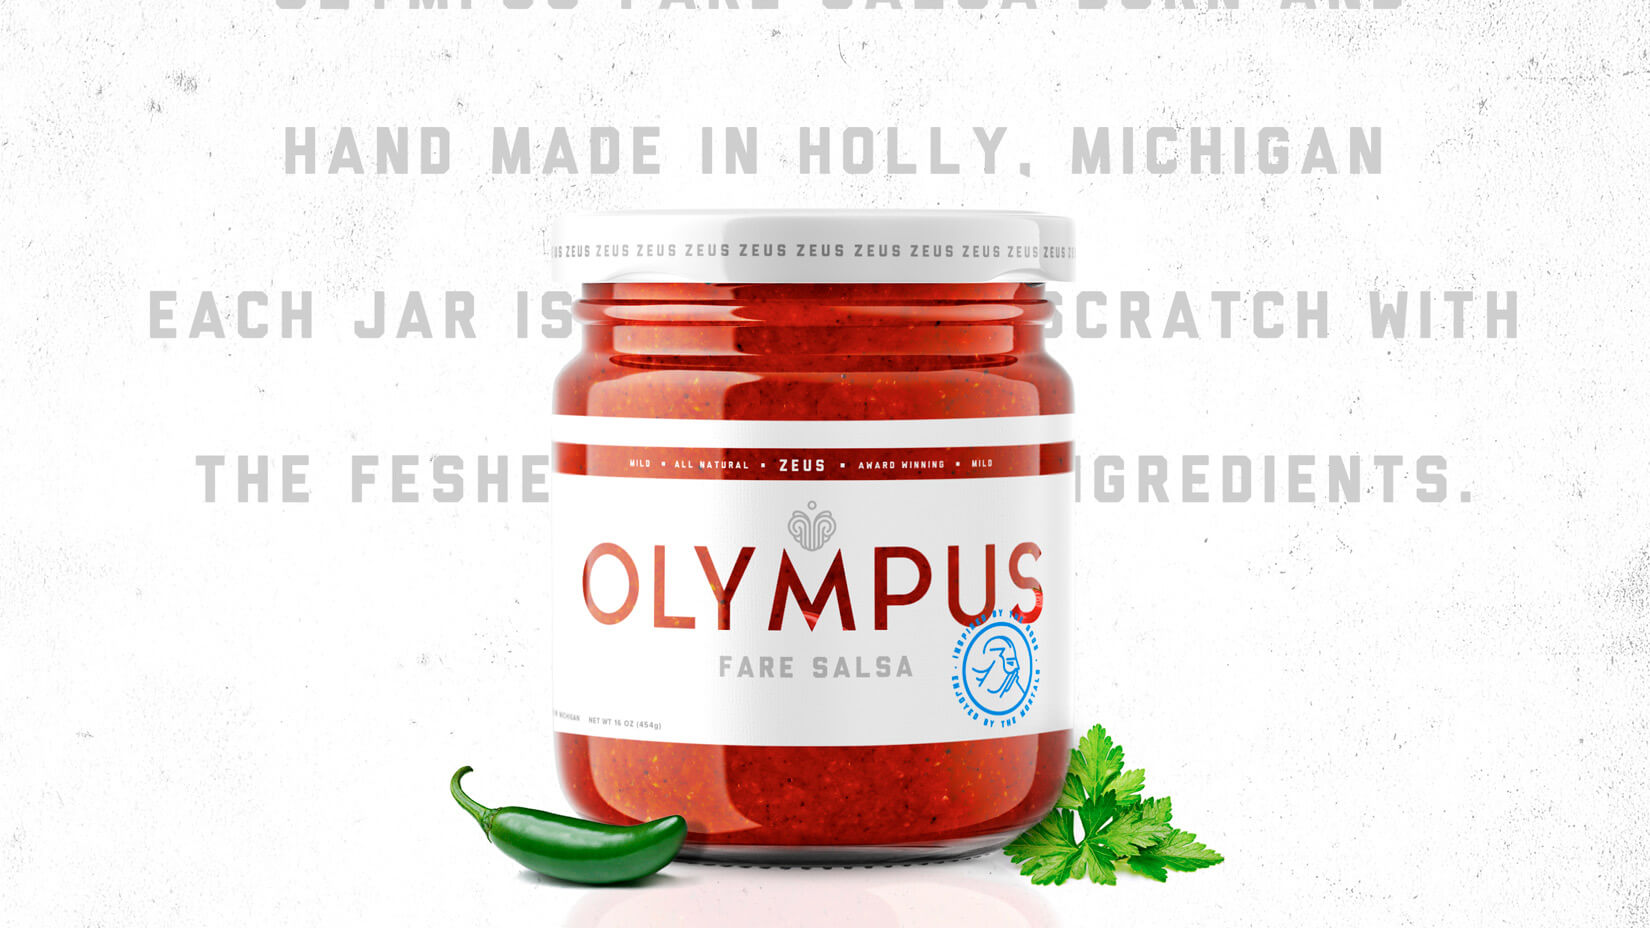 Olympus Fare Salsa